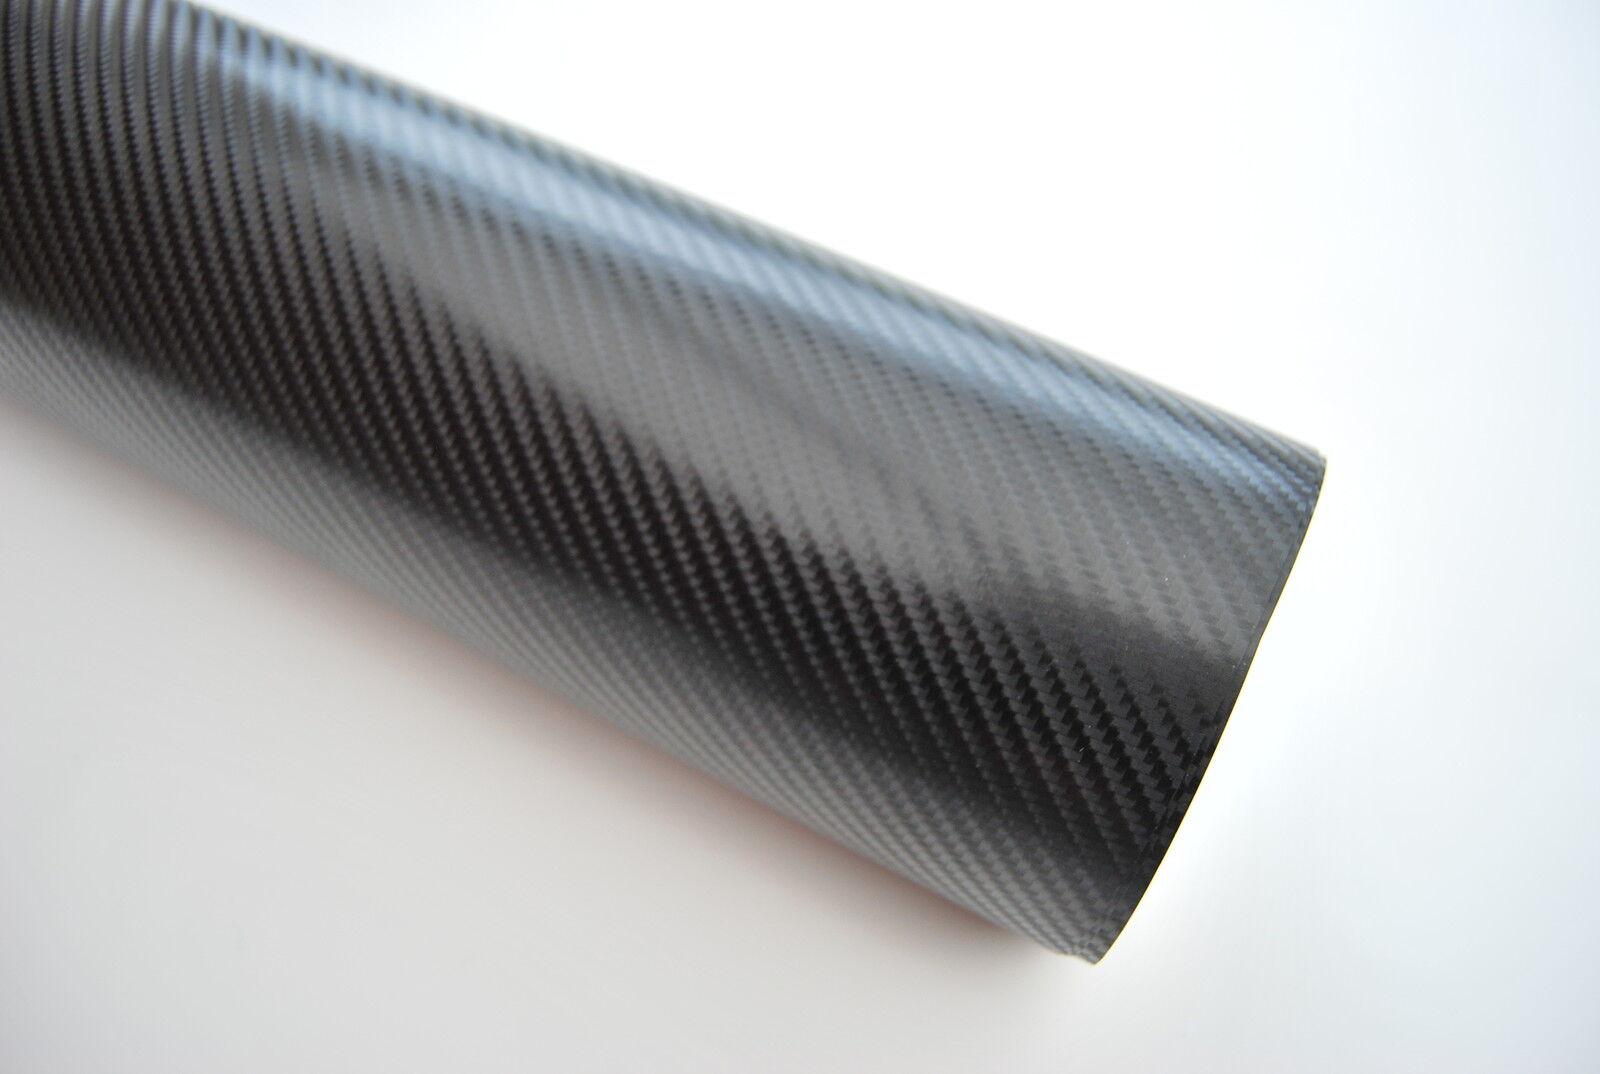 4D Kohlefaser Vinyl HlleAlle Zhler GrenSchwarz Luft Blasenfrei